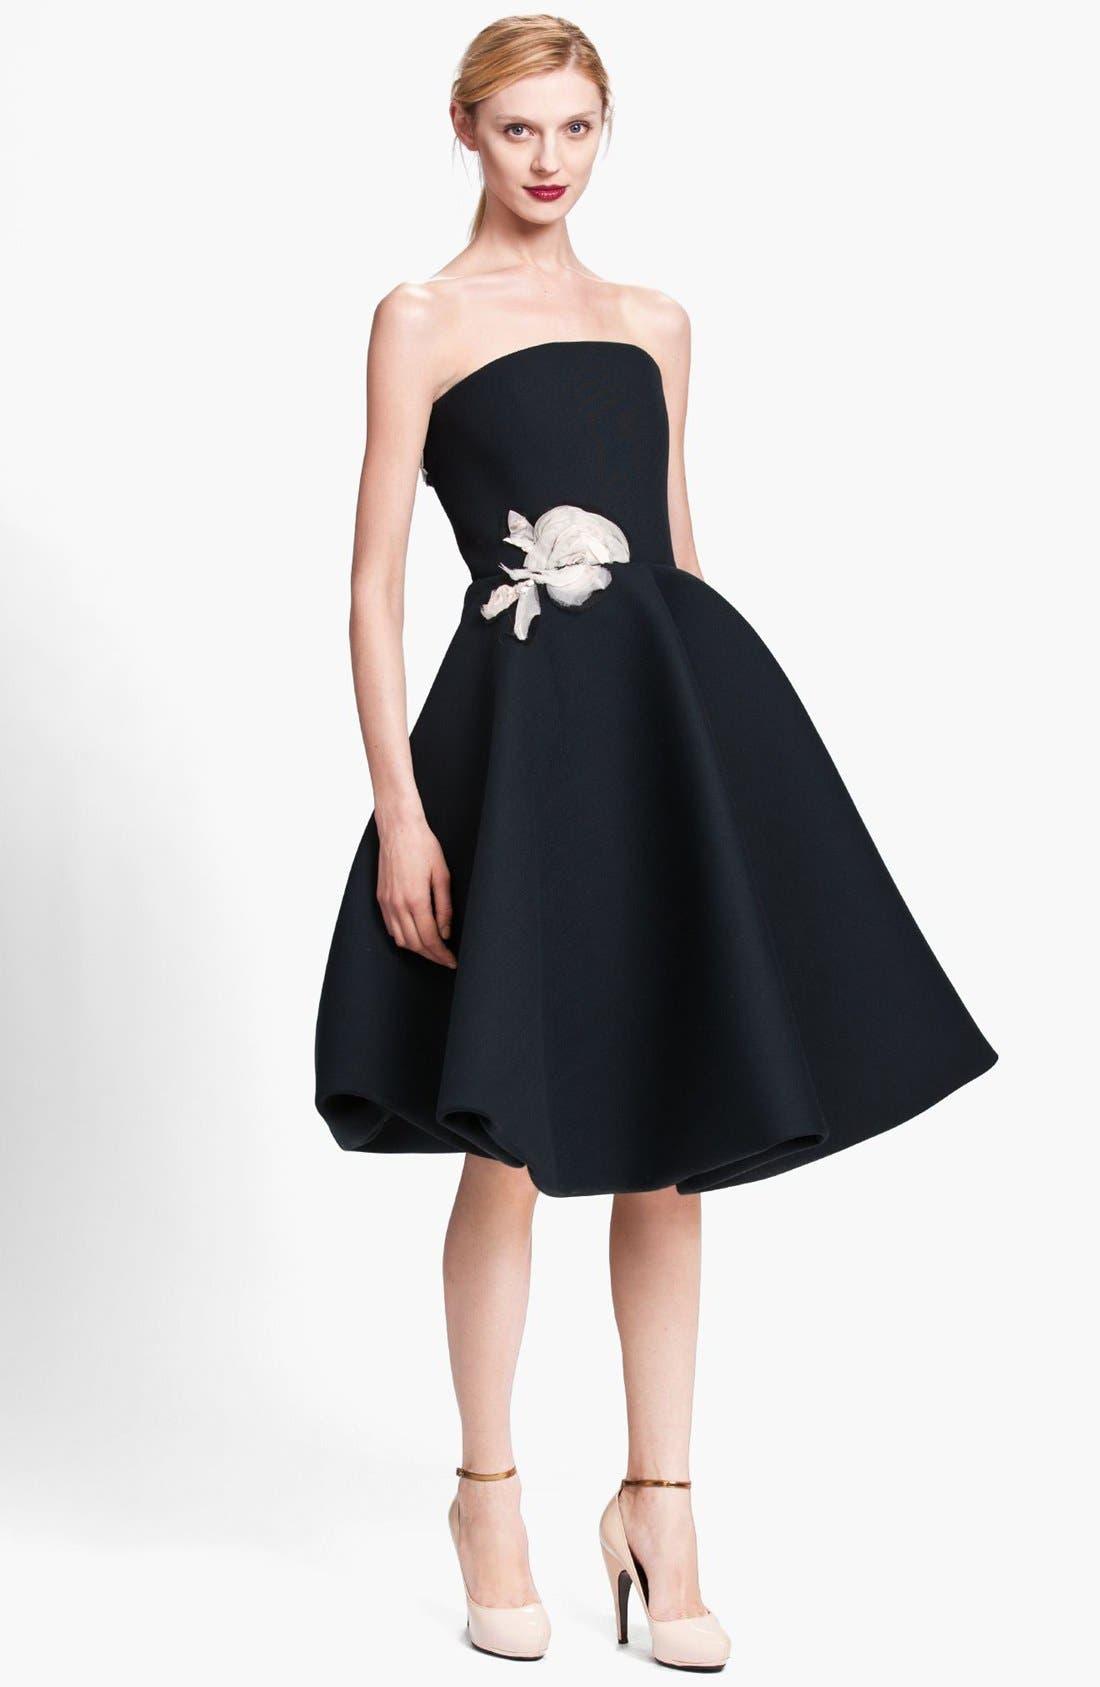 Alternate Image 1 Selected - Lanvin Floral Appliqué Strapless Dress